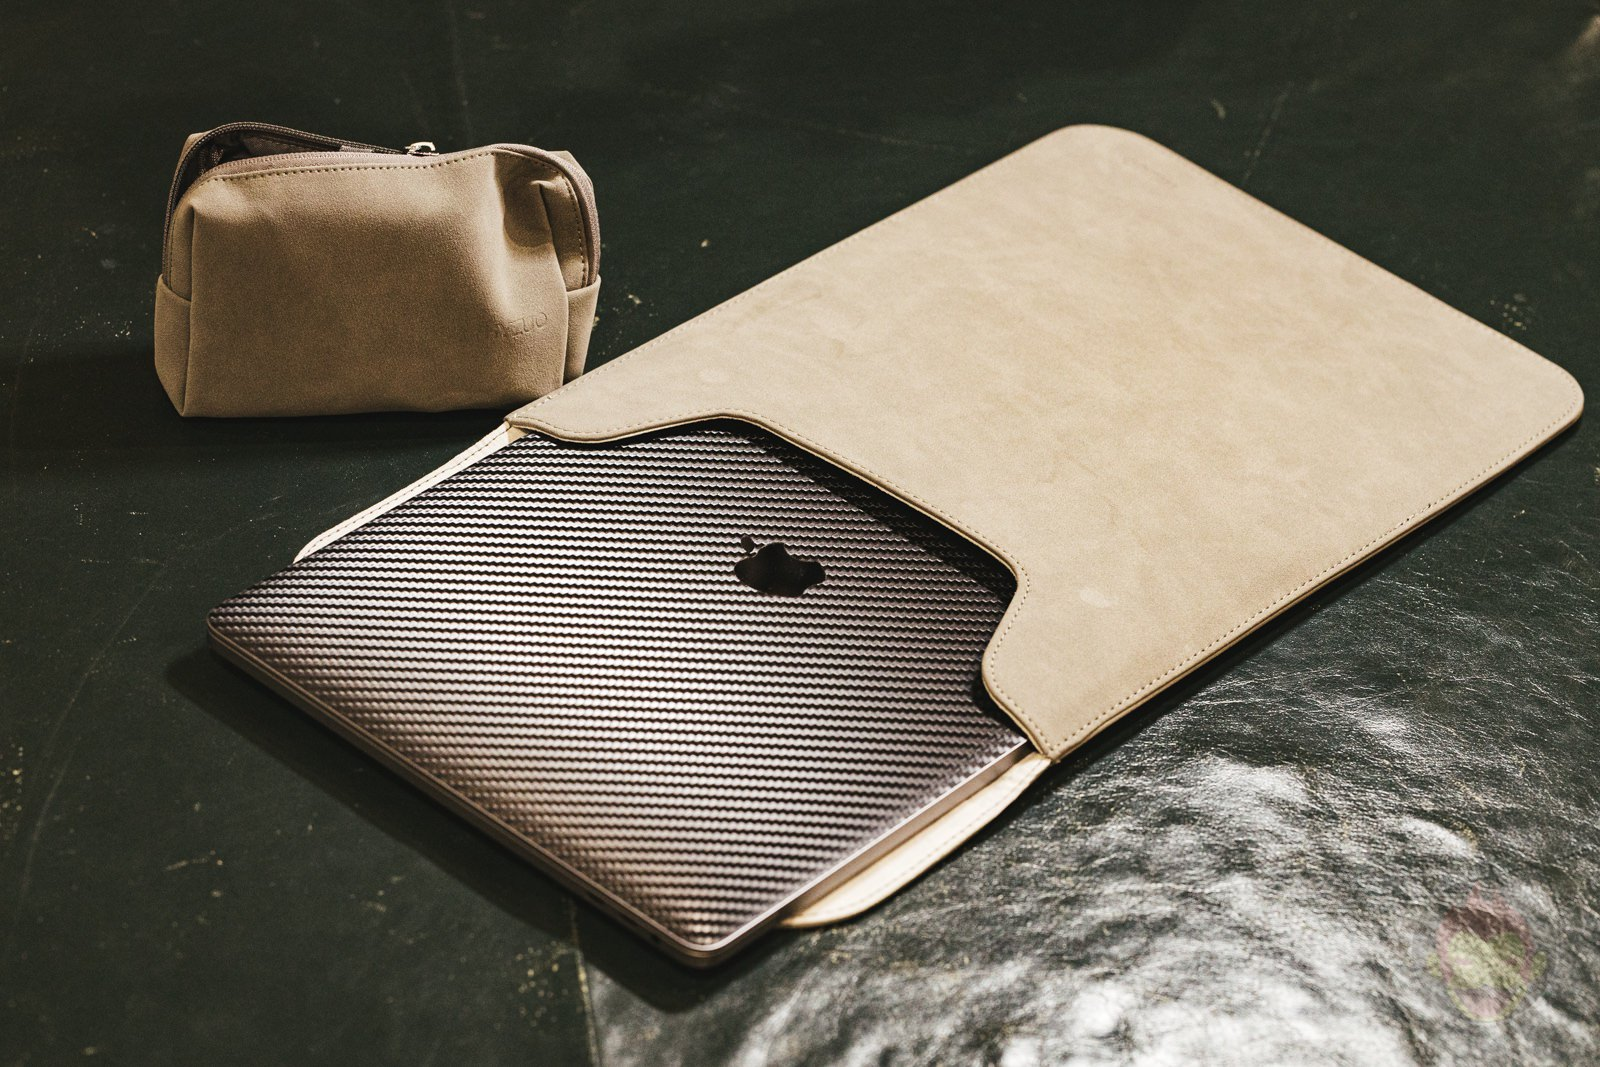 HYUZO-Laptop-Sleeve-review-01.jpg